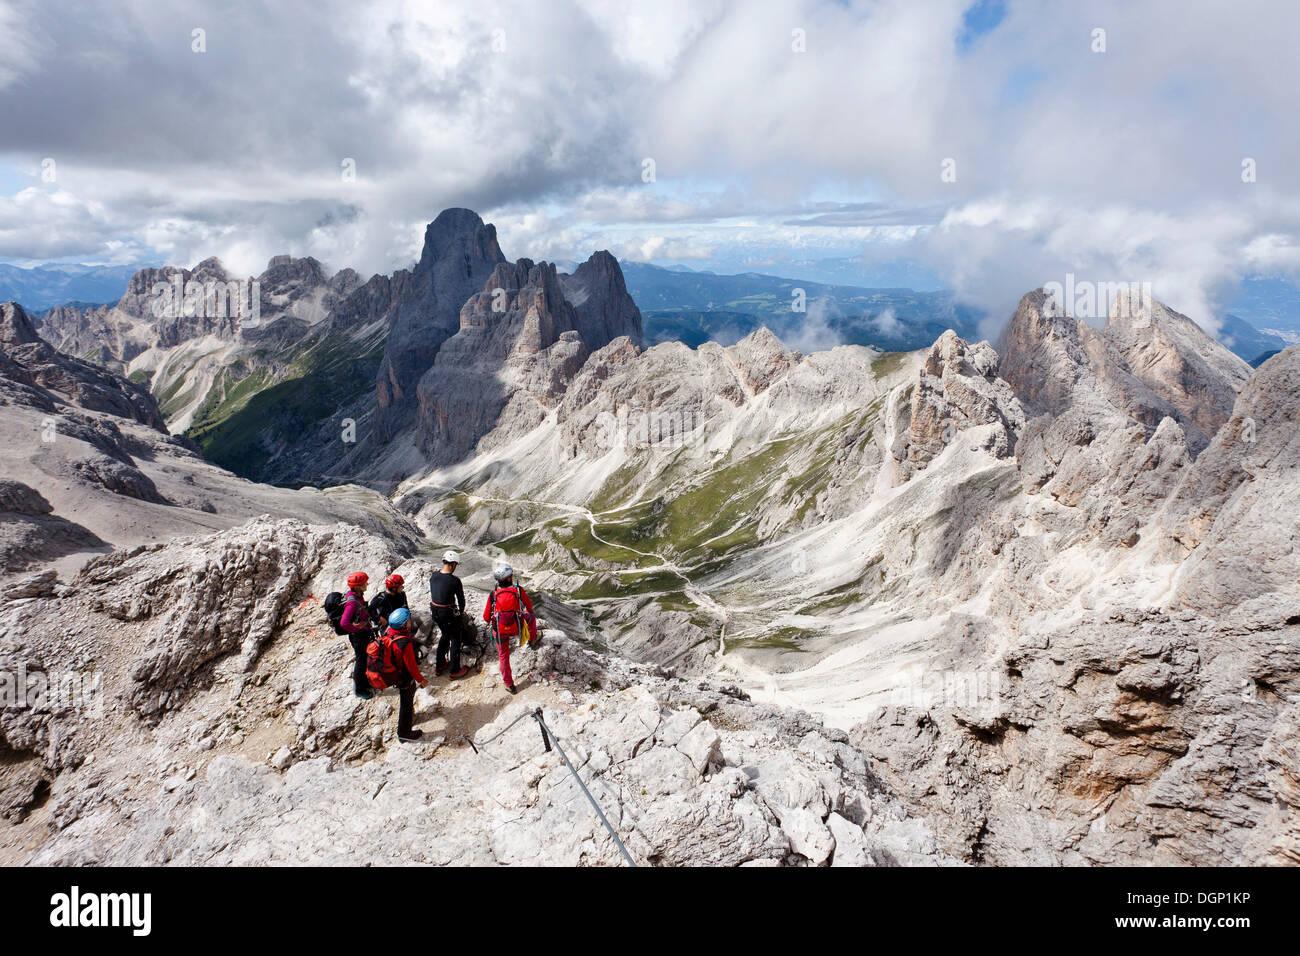 Klettersteig Rosengarten : Kletterer kesselkogel bergbesteigung über den klettersteig